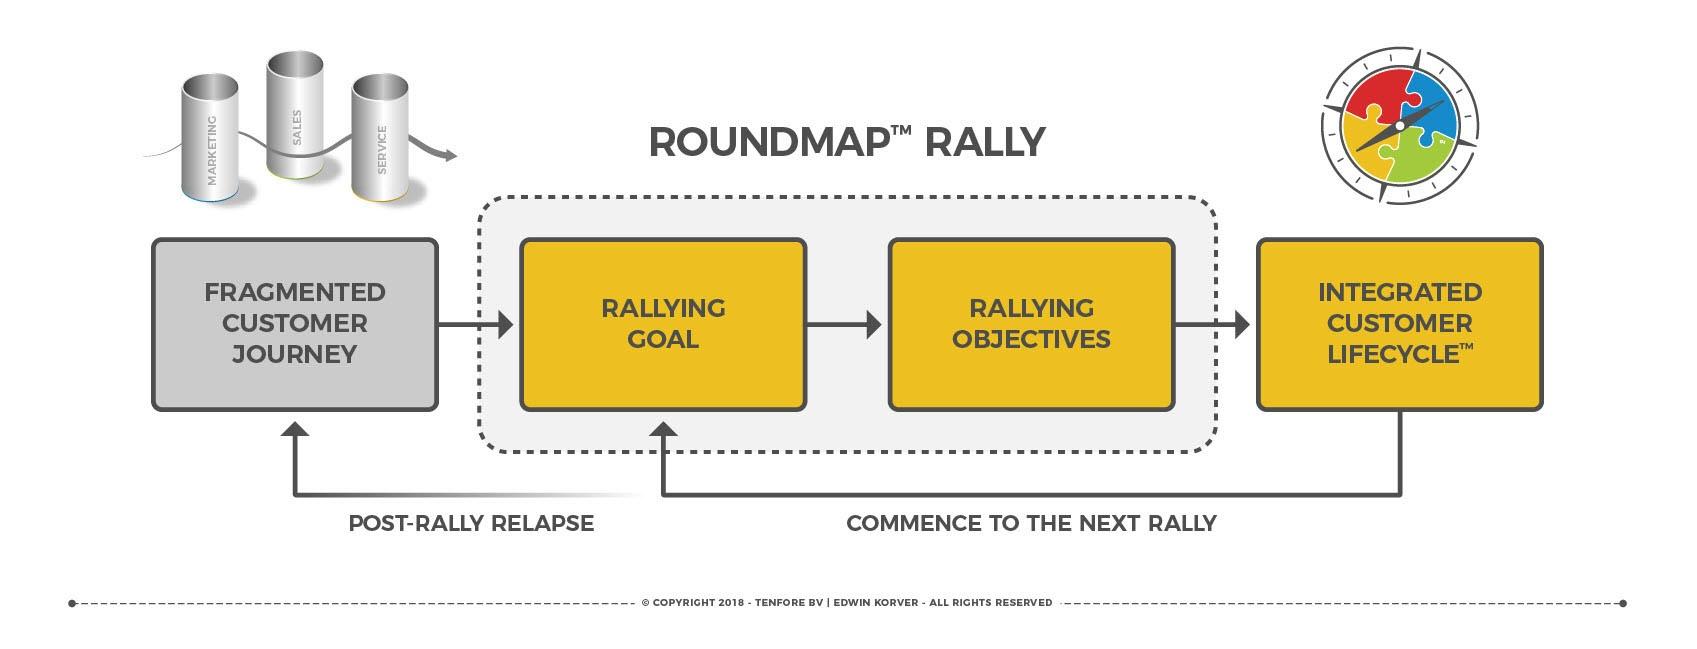 ROUNDMAP Rally